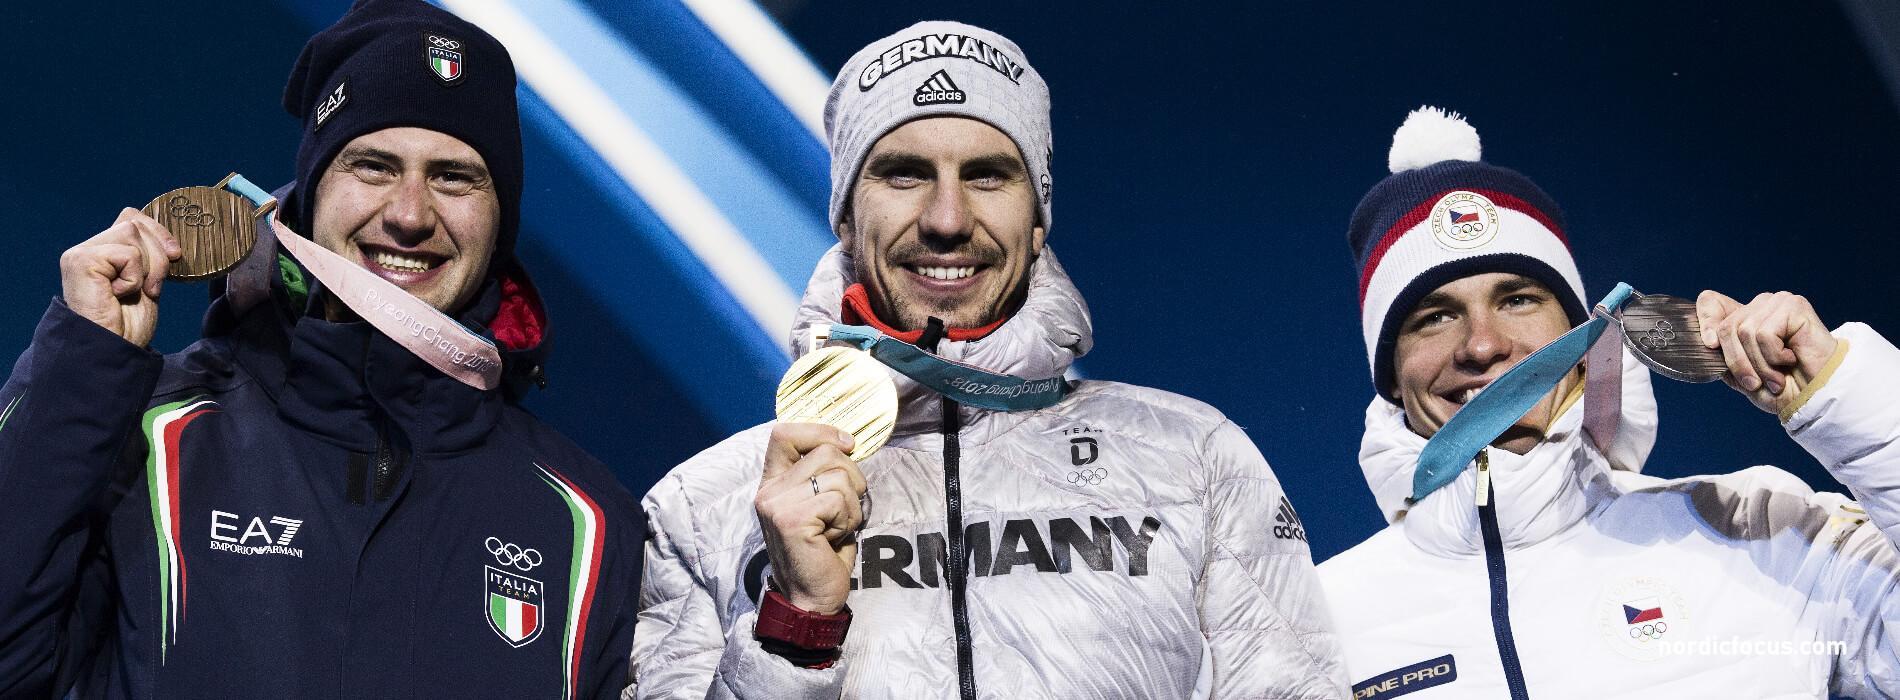 Arnd Peiffer Olympia 2018 Siegerehrung Gold